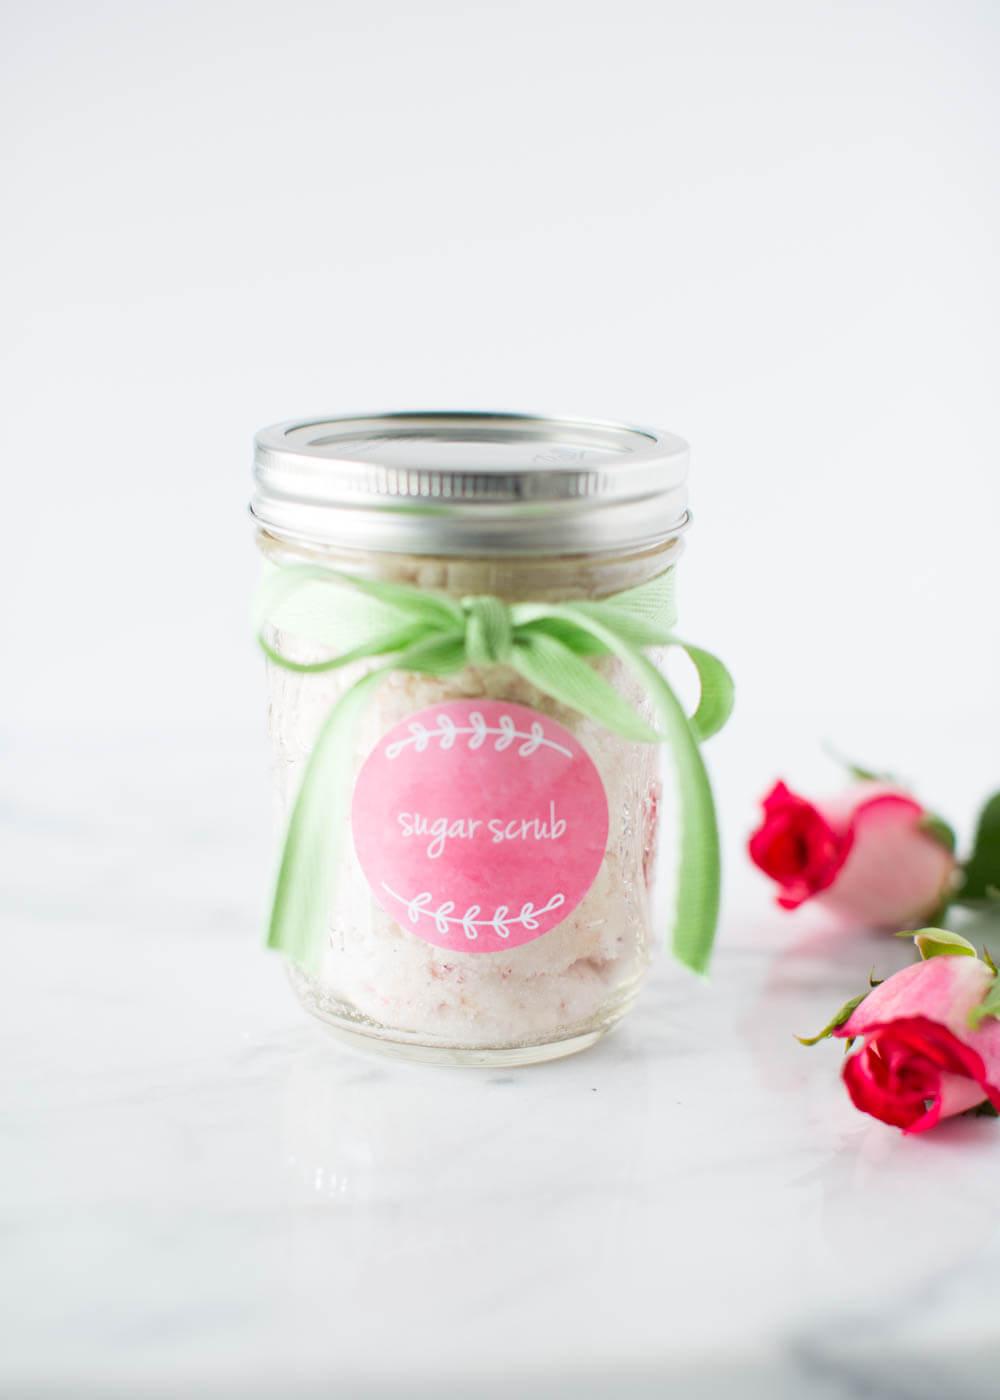 Vanilla sugar scrub in a mason jar with green ribbon